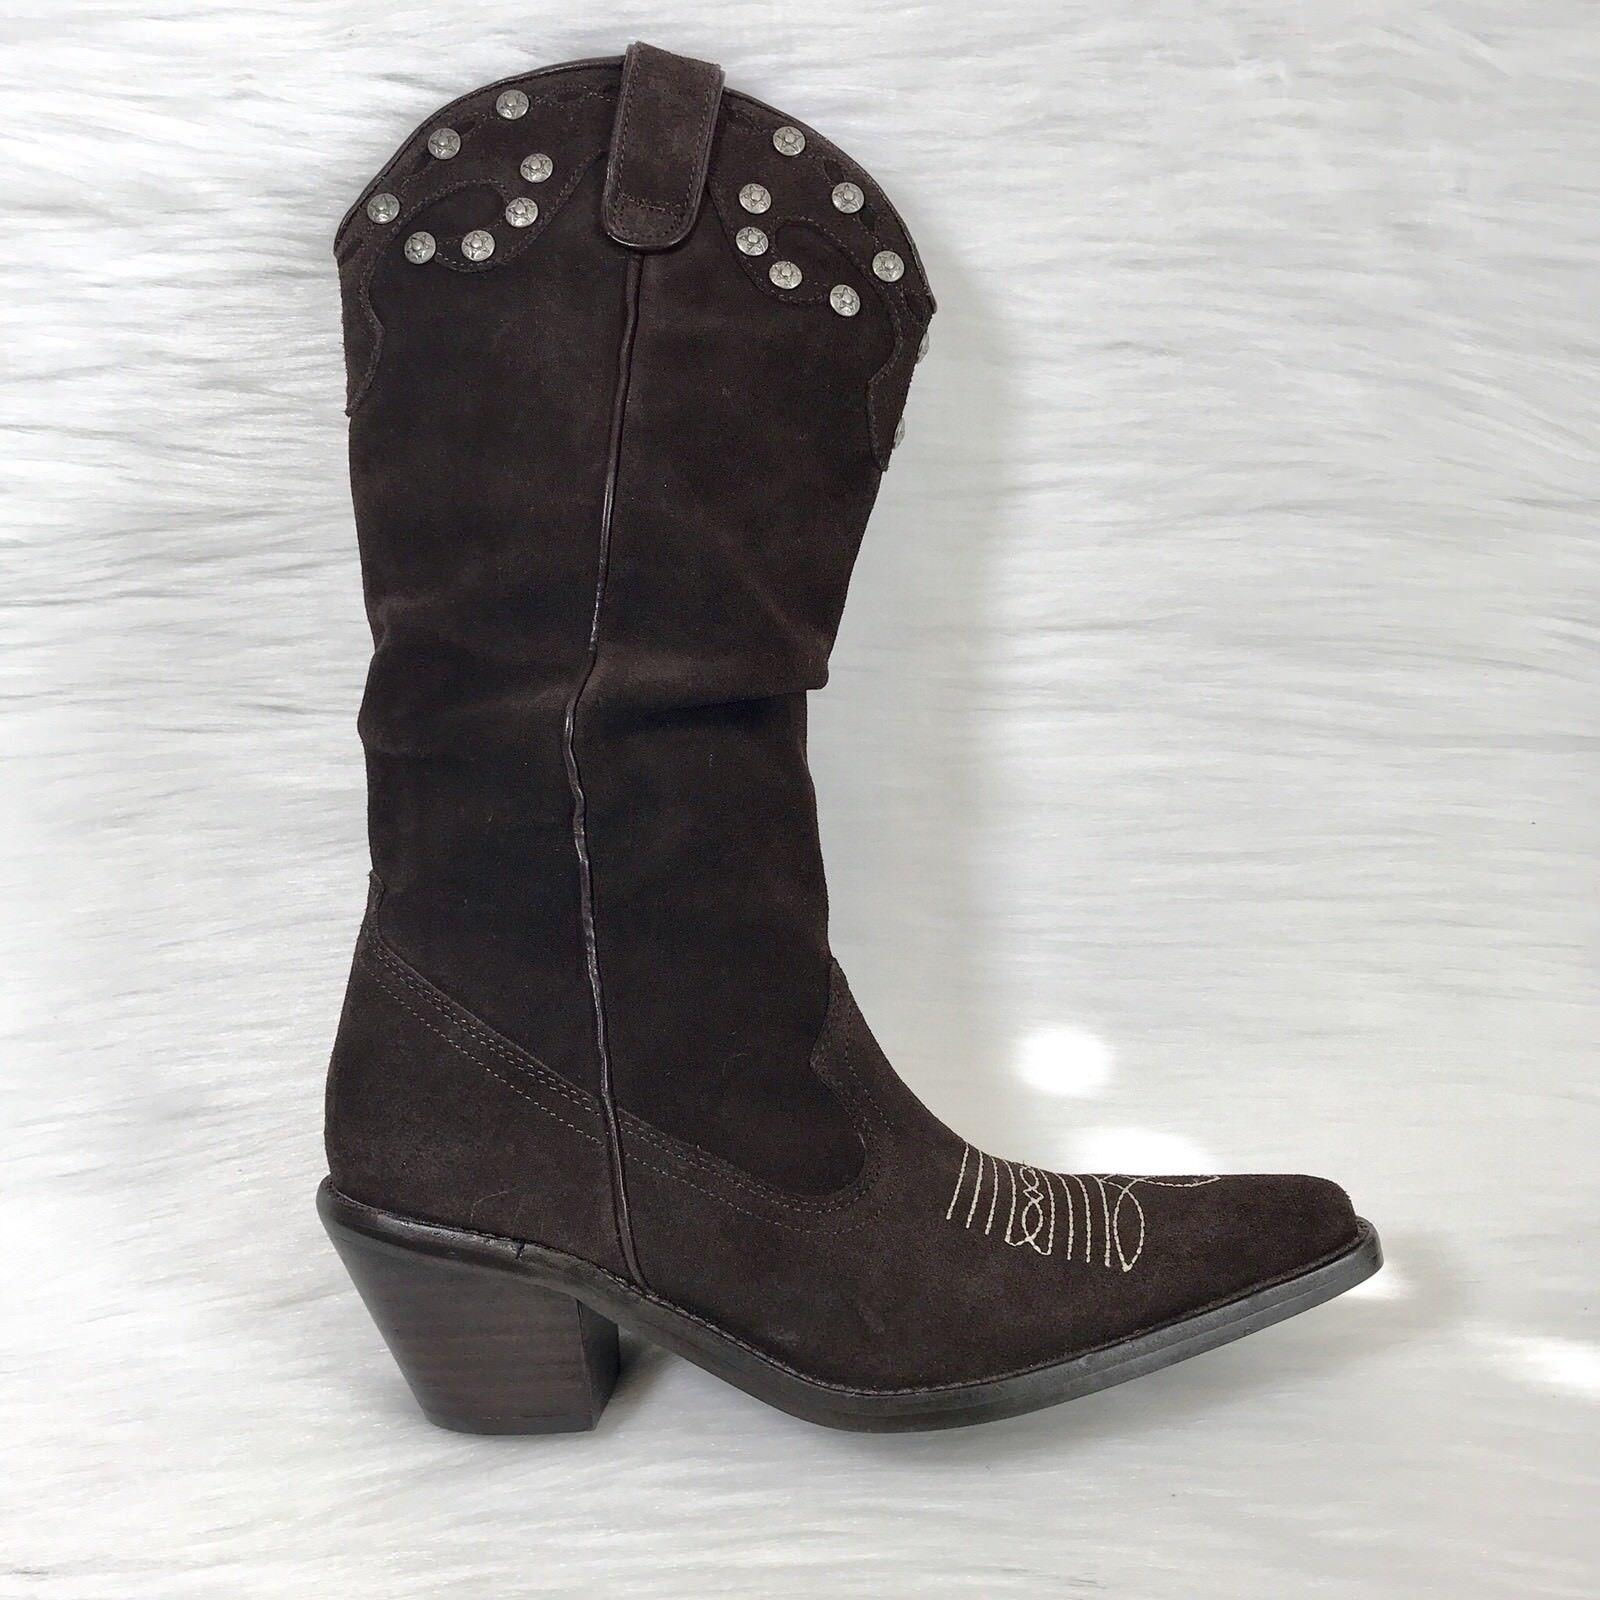 Gillian Julius Women's Boots Western Cowboy Brown Suede stars studs Size 6